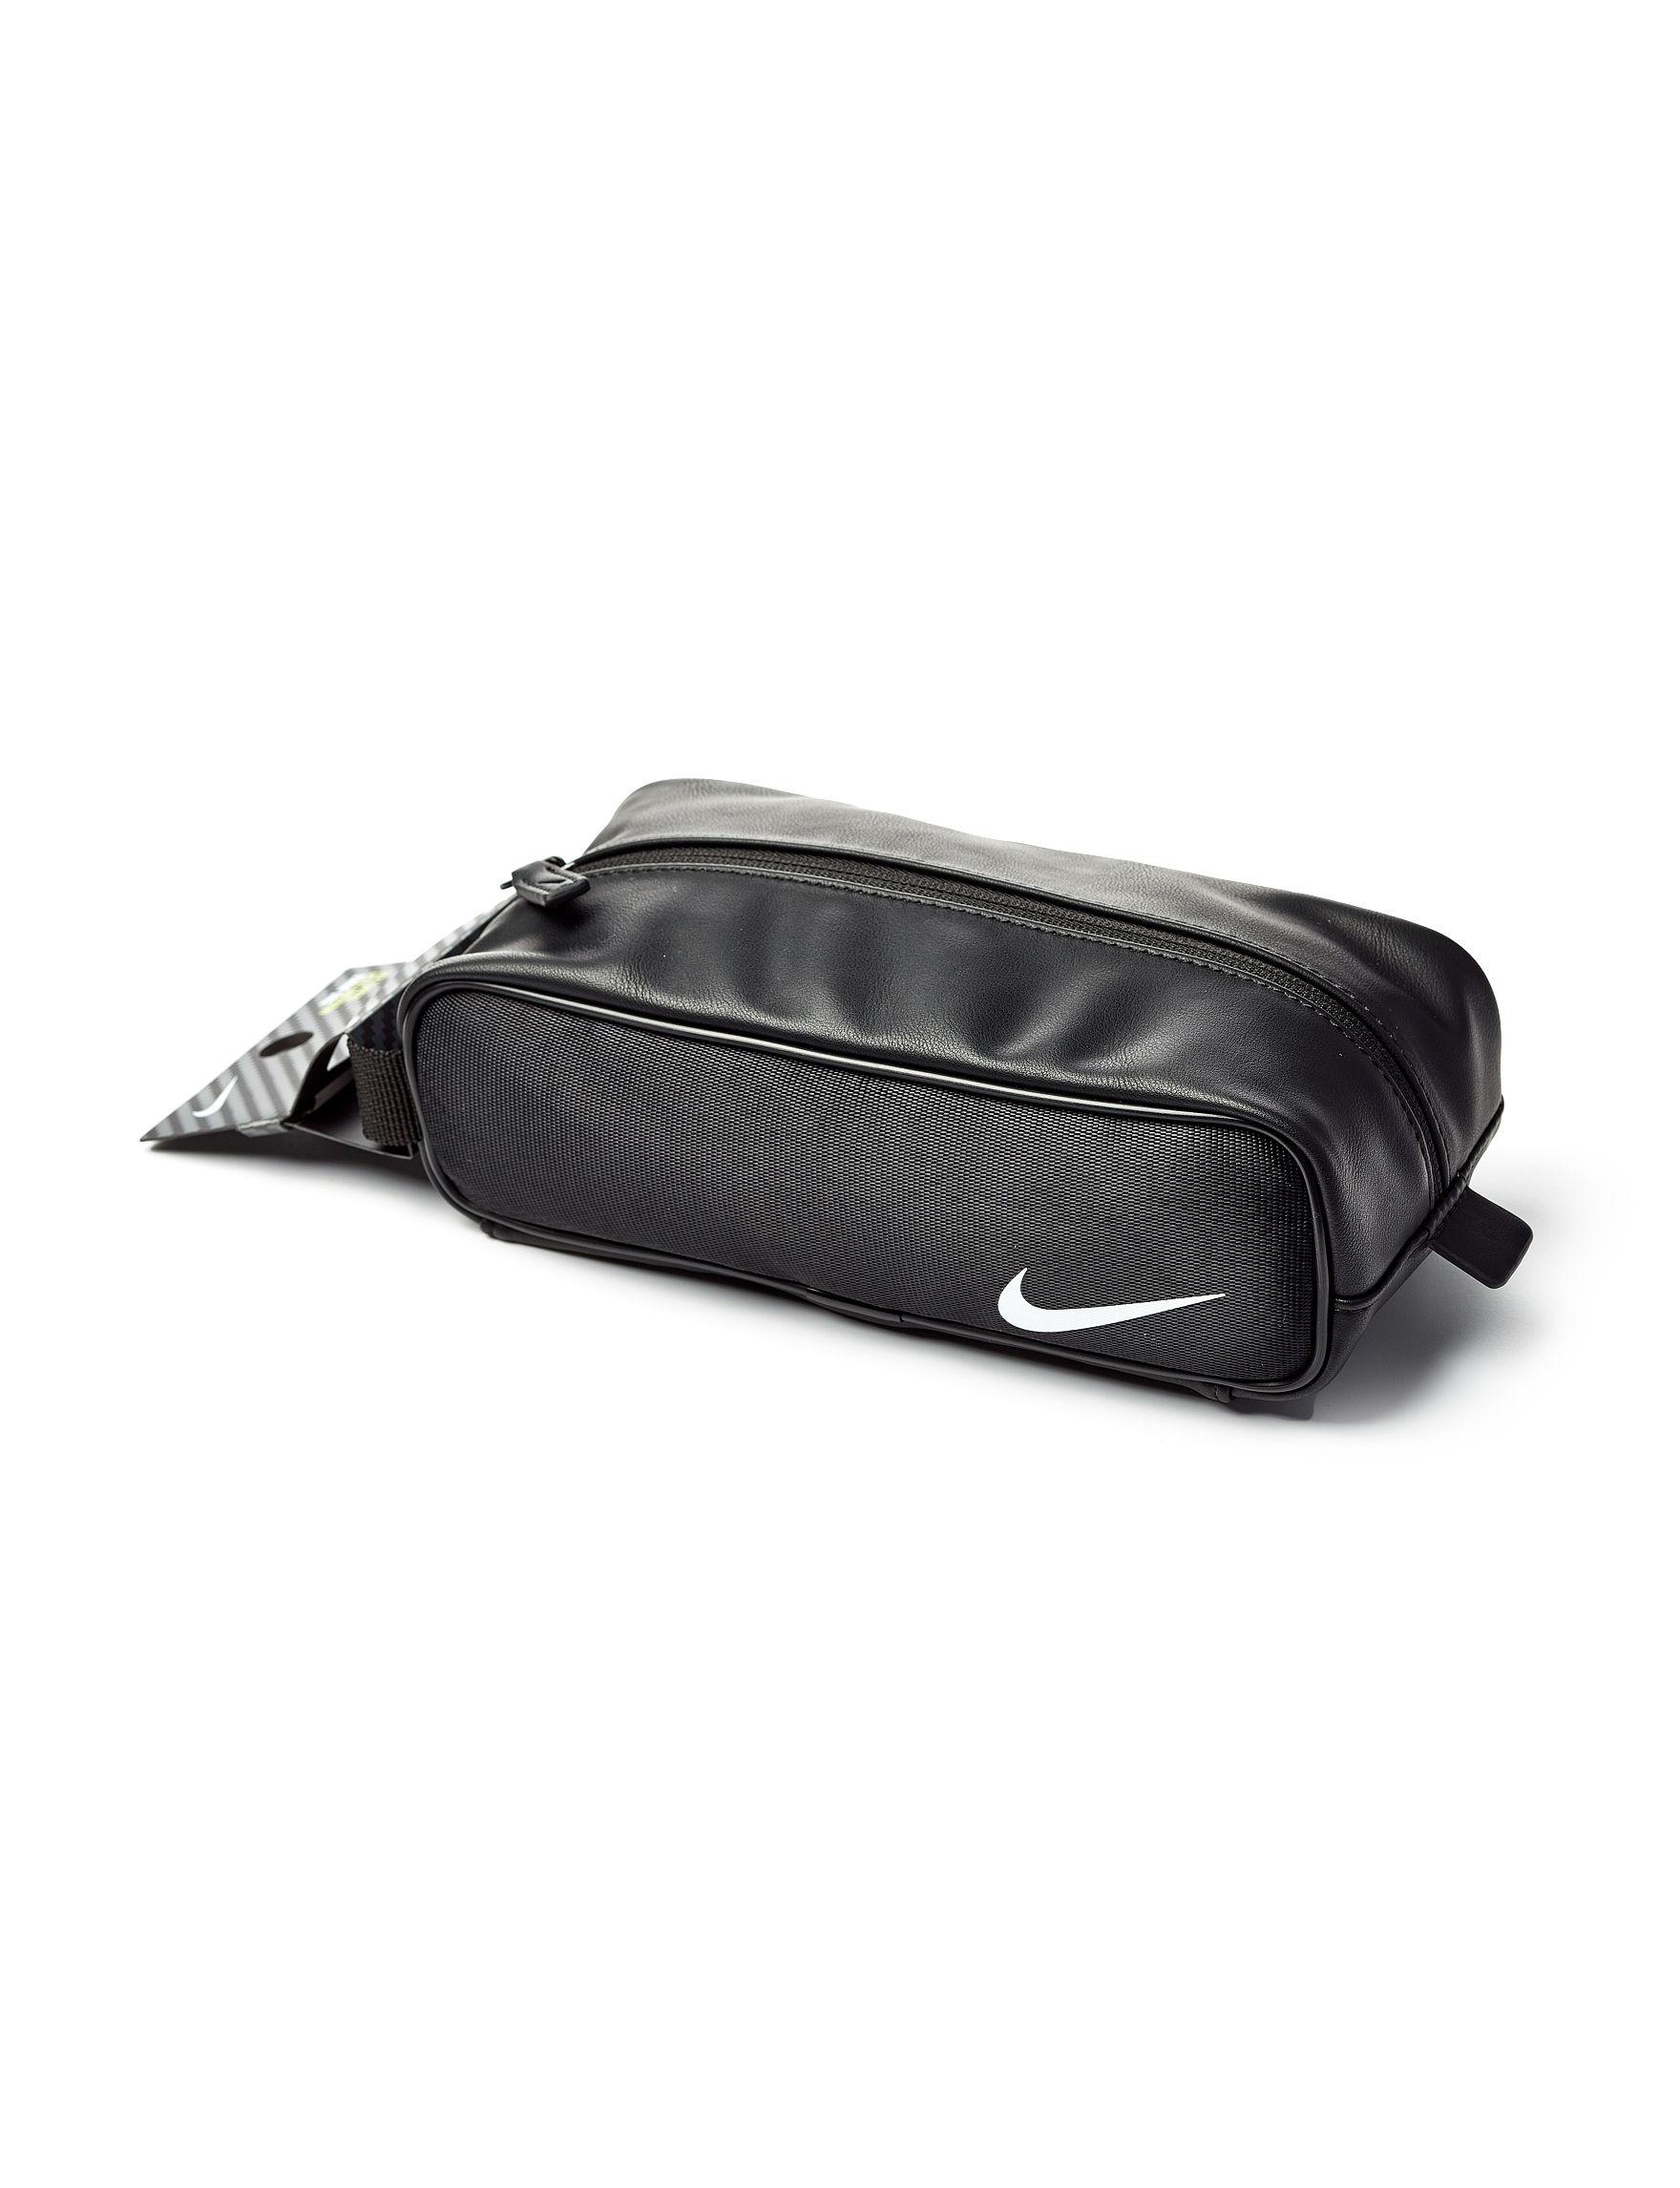 Nike Black Travel Accessories